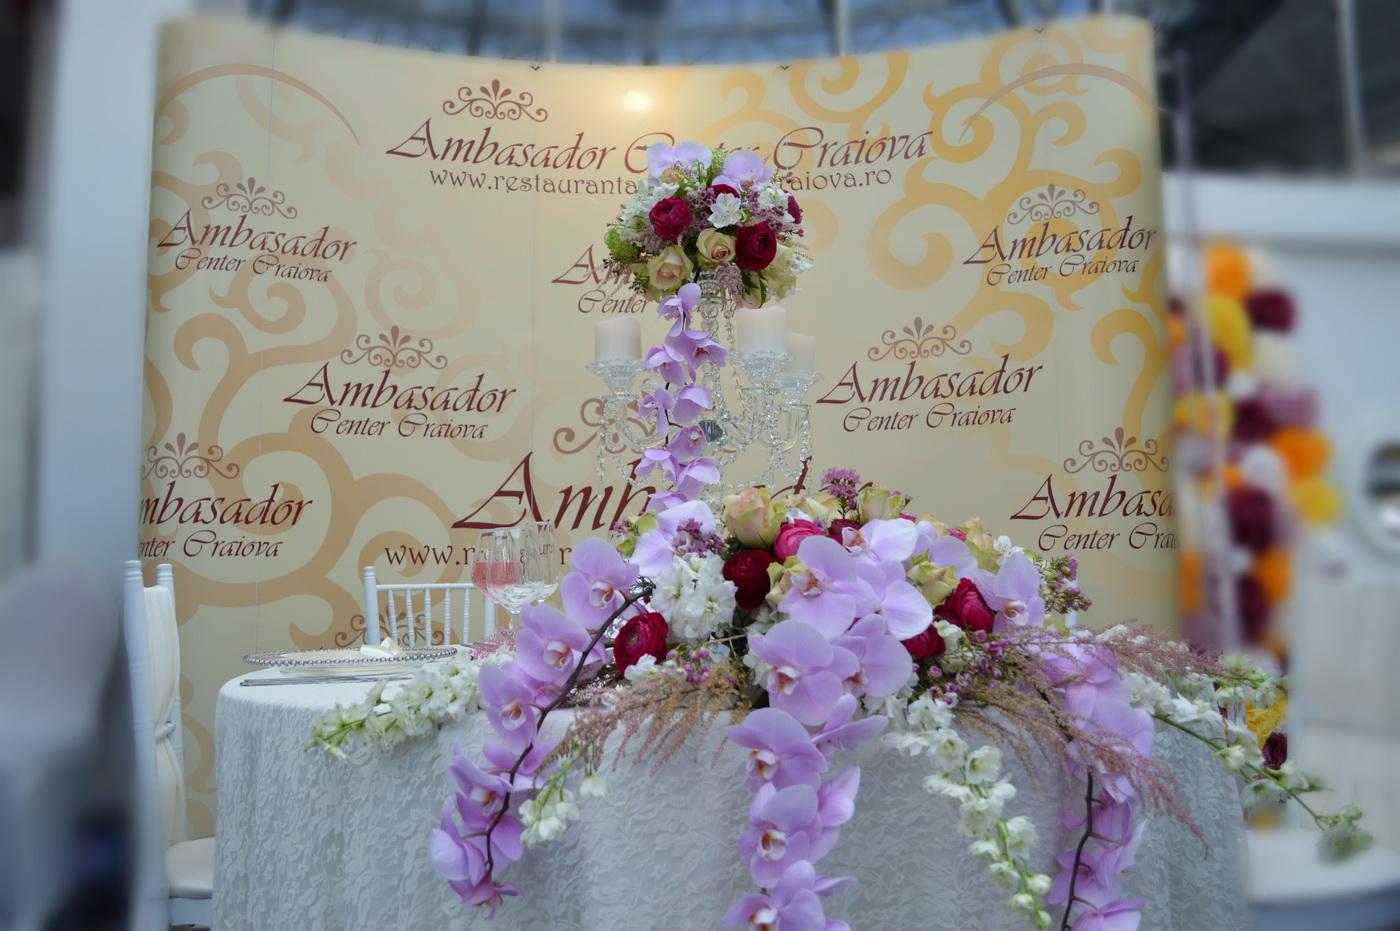 "Targul de nunti ""Wedding Fever"" 2017 Editia a VIII-a Craiova | Galerie Foto Ziua 2 | Restaurant Nunta, Botez, Corporate, Evenimente Craiova | Ambasador Center Craiova"